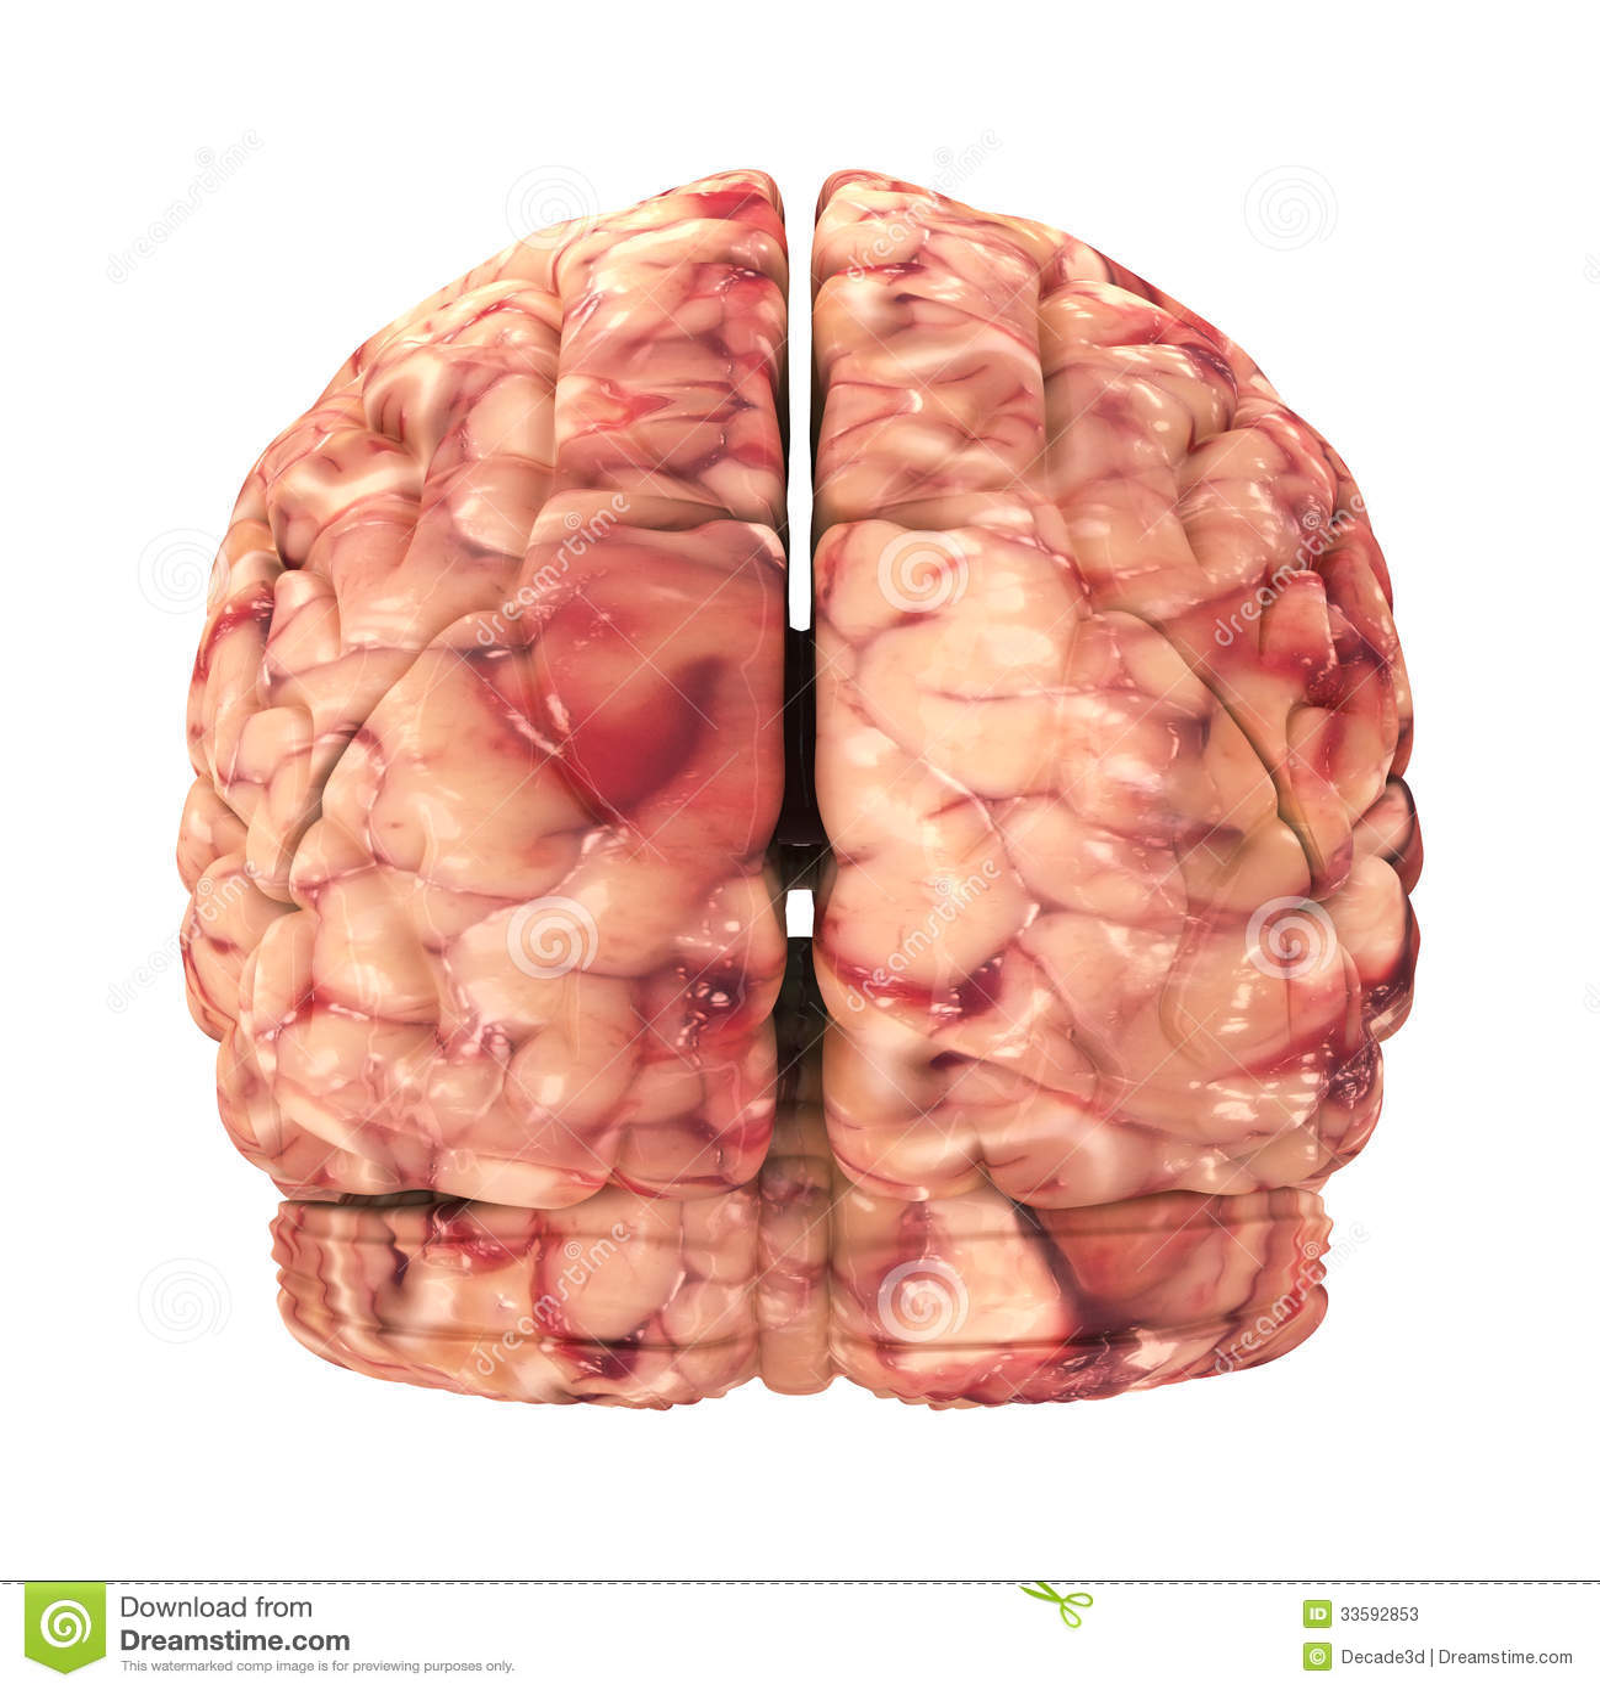 Anatomy Brain - Back View Isolated Stock Illustration - Illustration ...